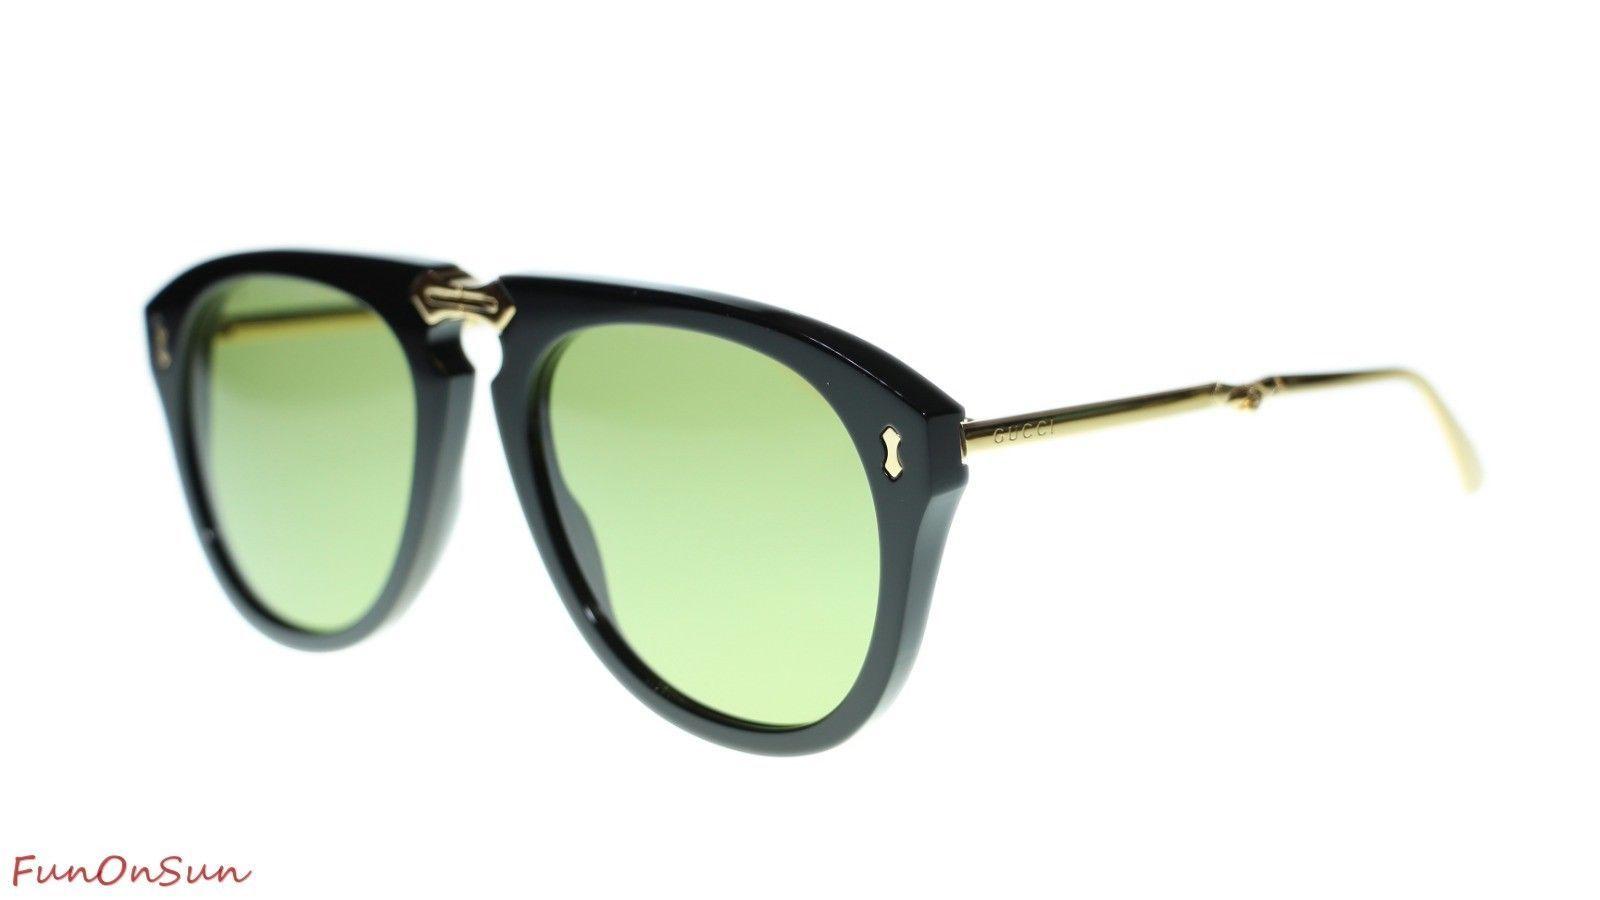 c9bd373f2c6 10. 10. Previous. NEW Gucci Men s Sunglasses GG0305S 001 Black Gold Green  Lens 56mm Authentic